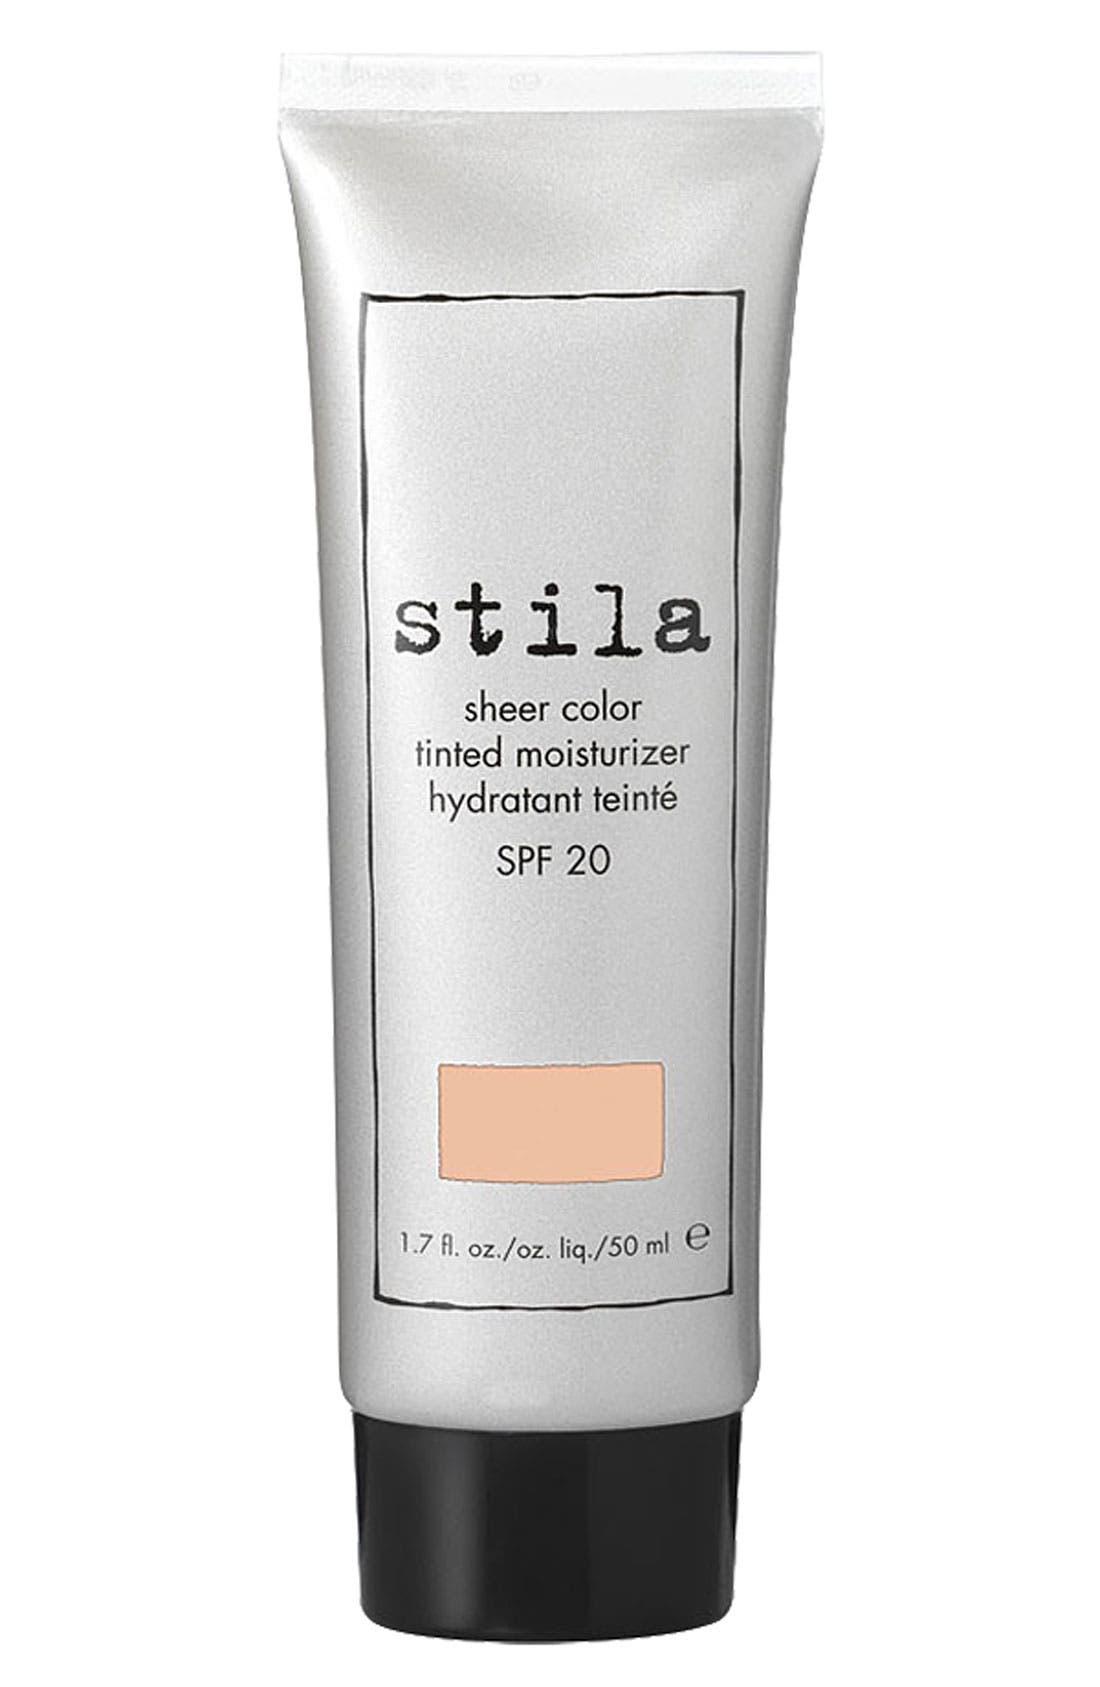 stila 'sheer color' tinted moisturizer SPF 20